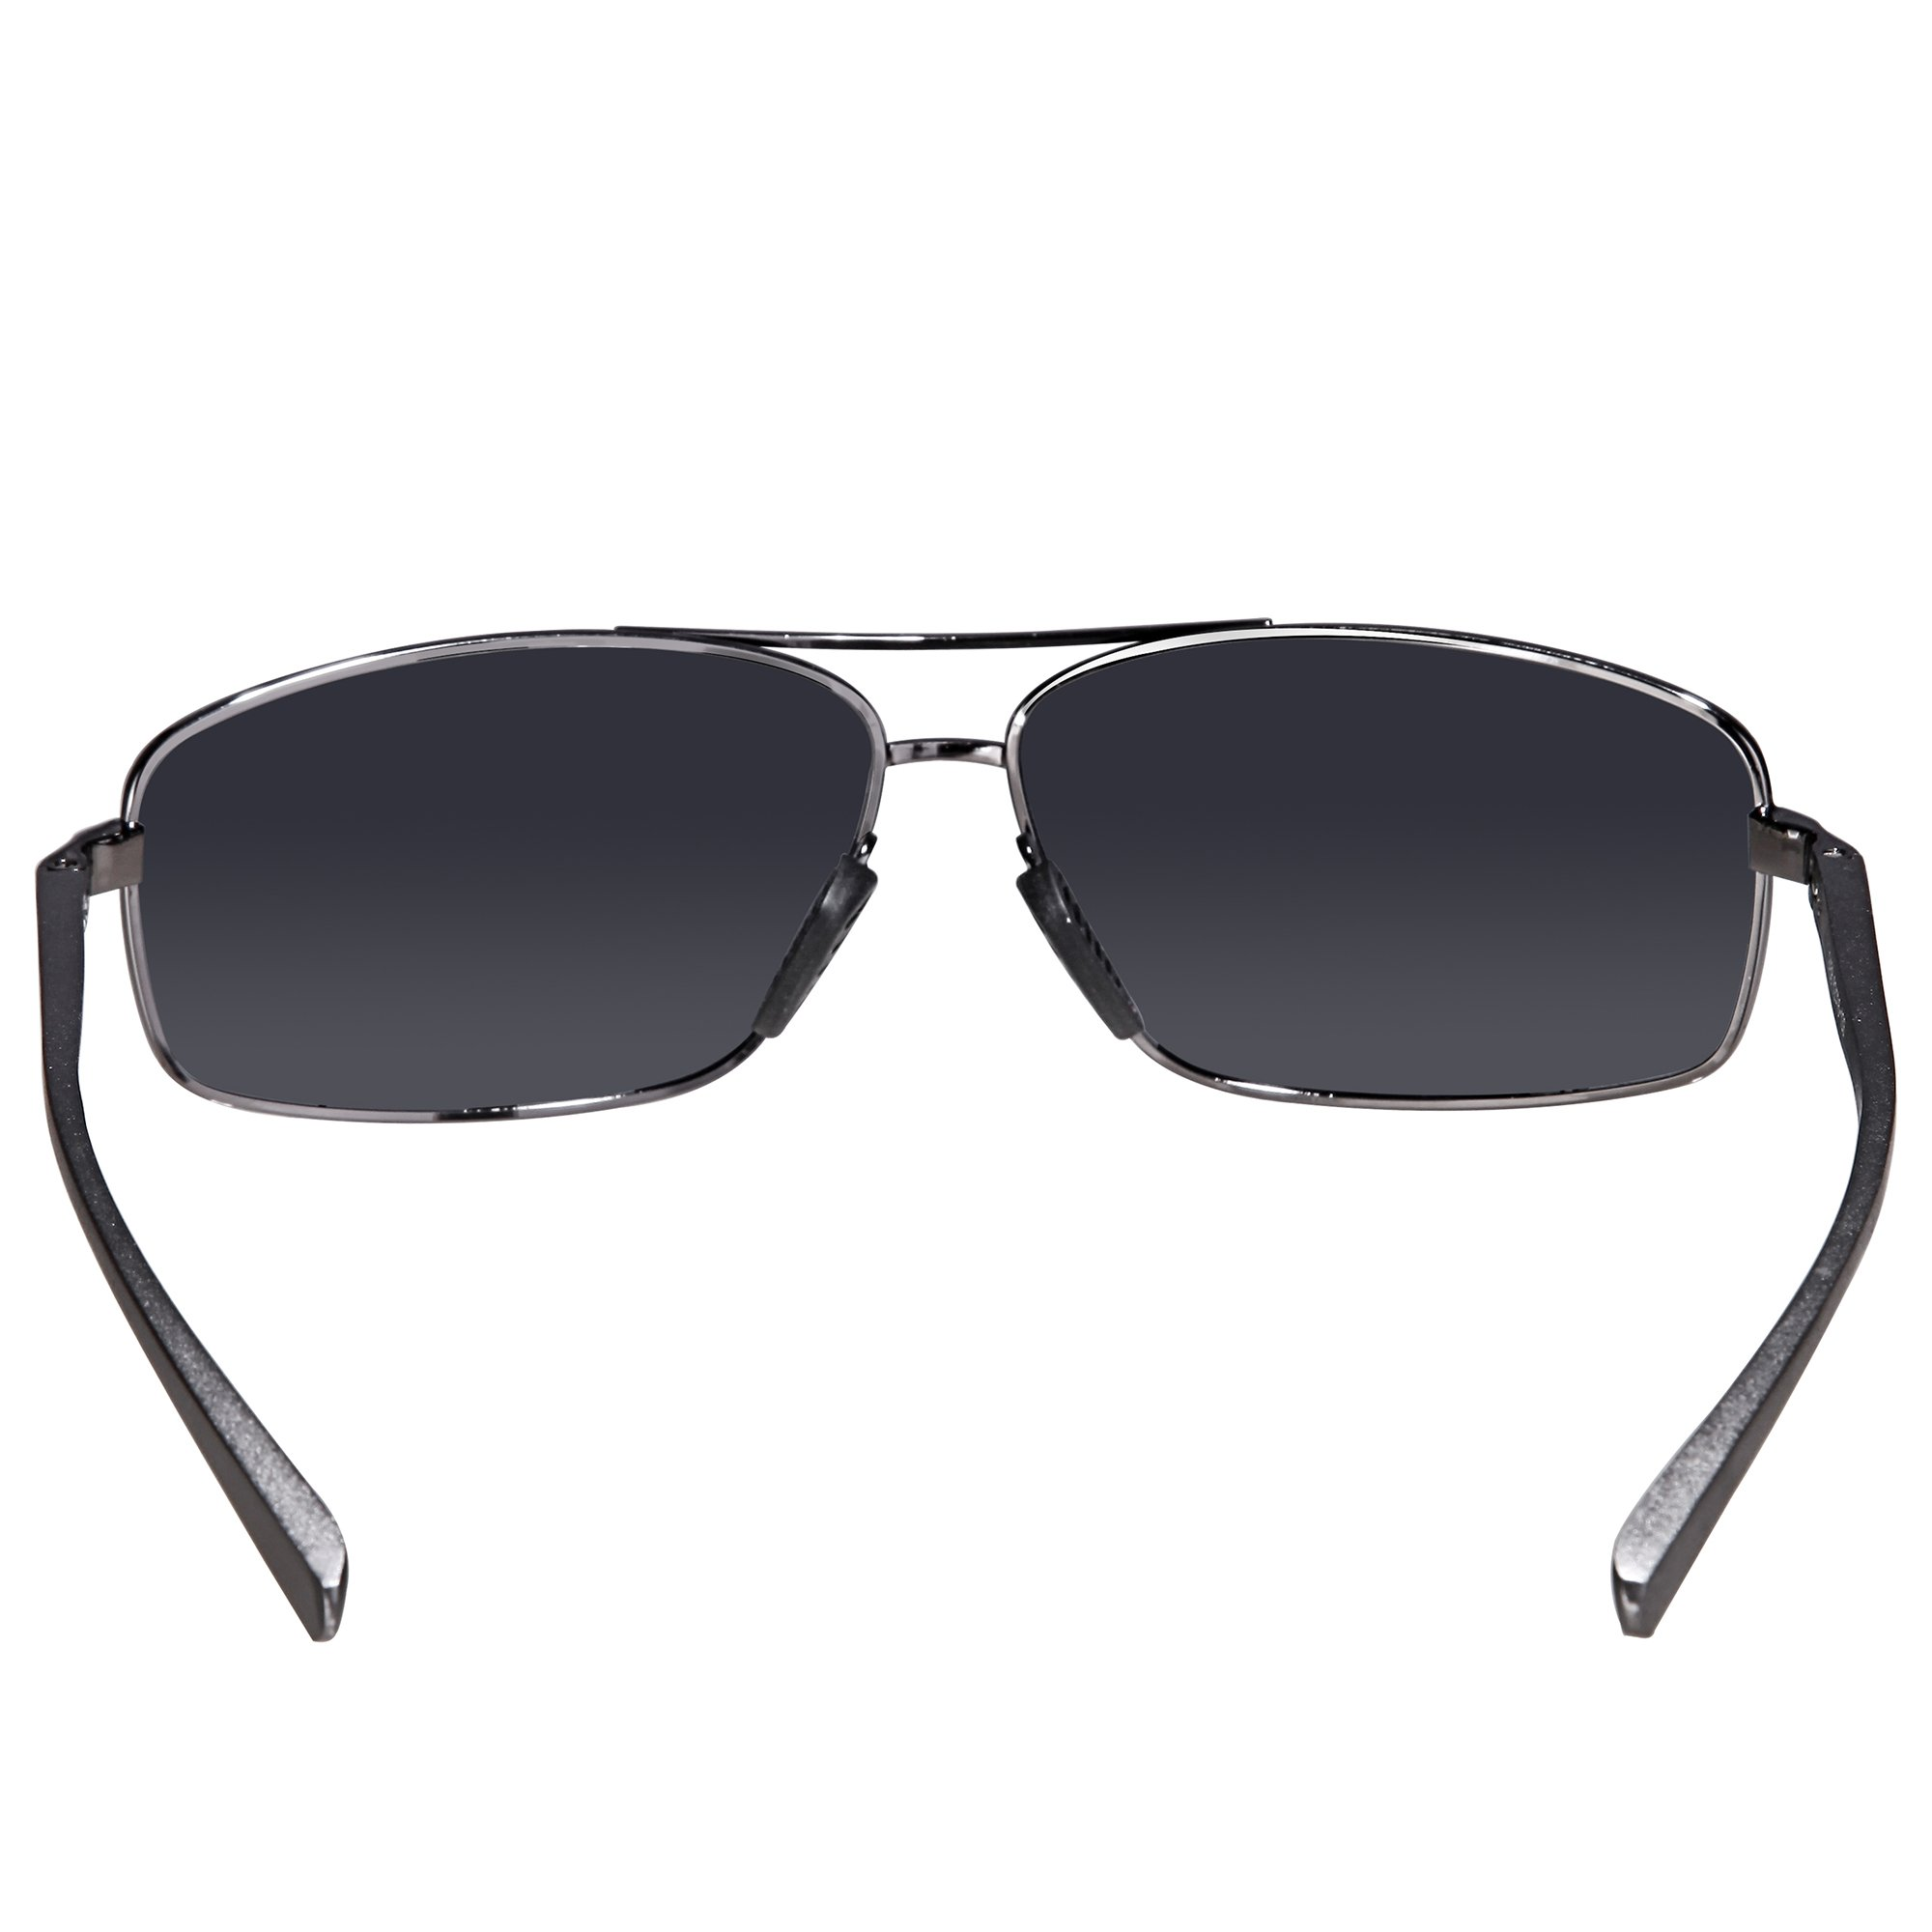 cd0c40a362 SUNGAIT Ultra Lightweight Rectangular Polarized Sunglasses 100% UV  protection